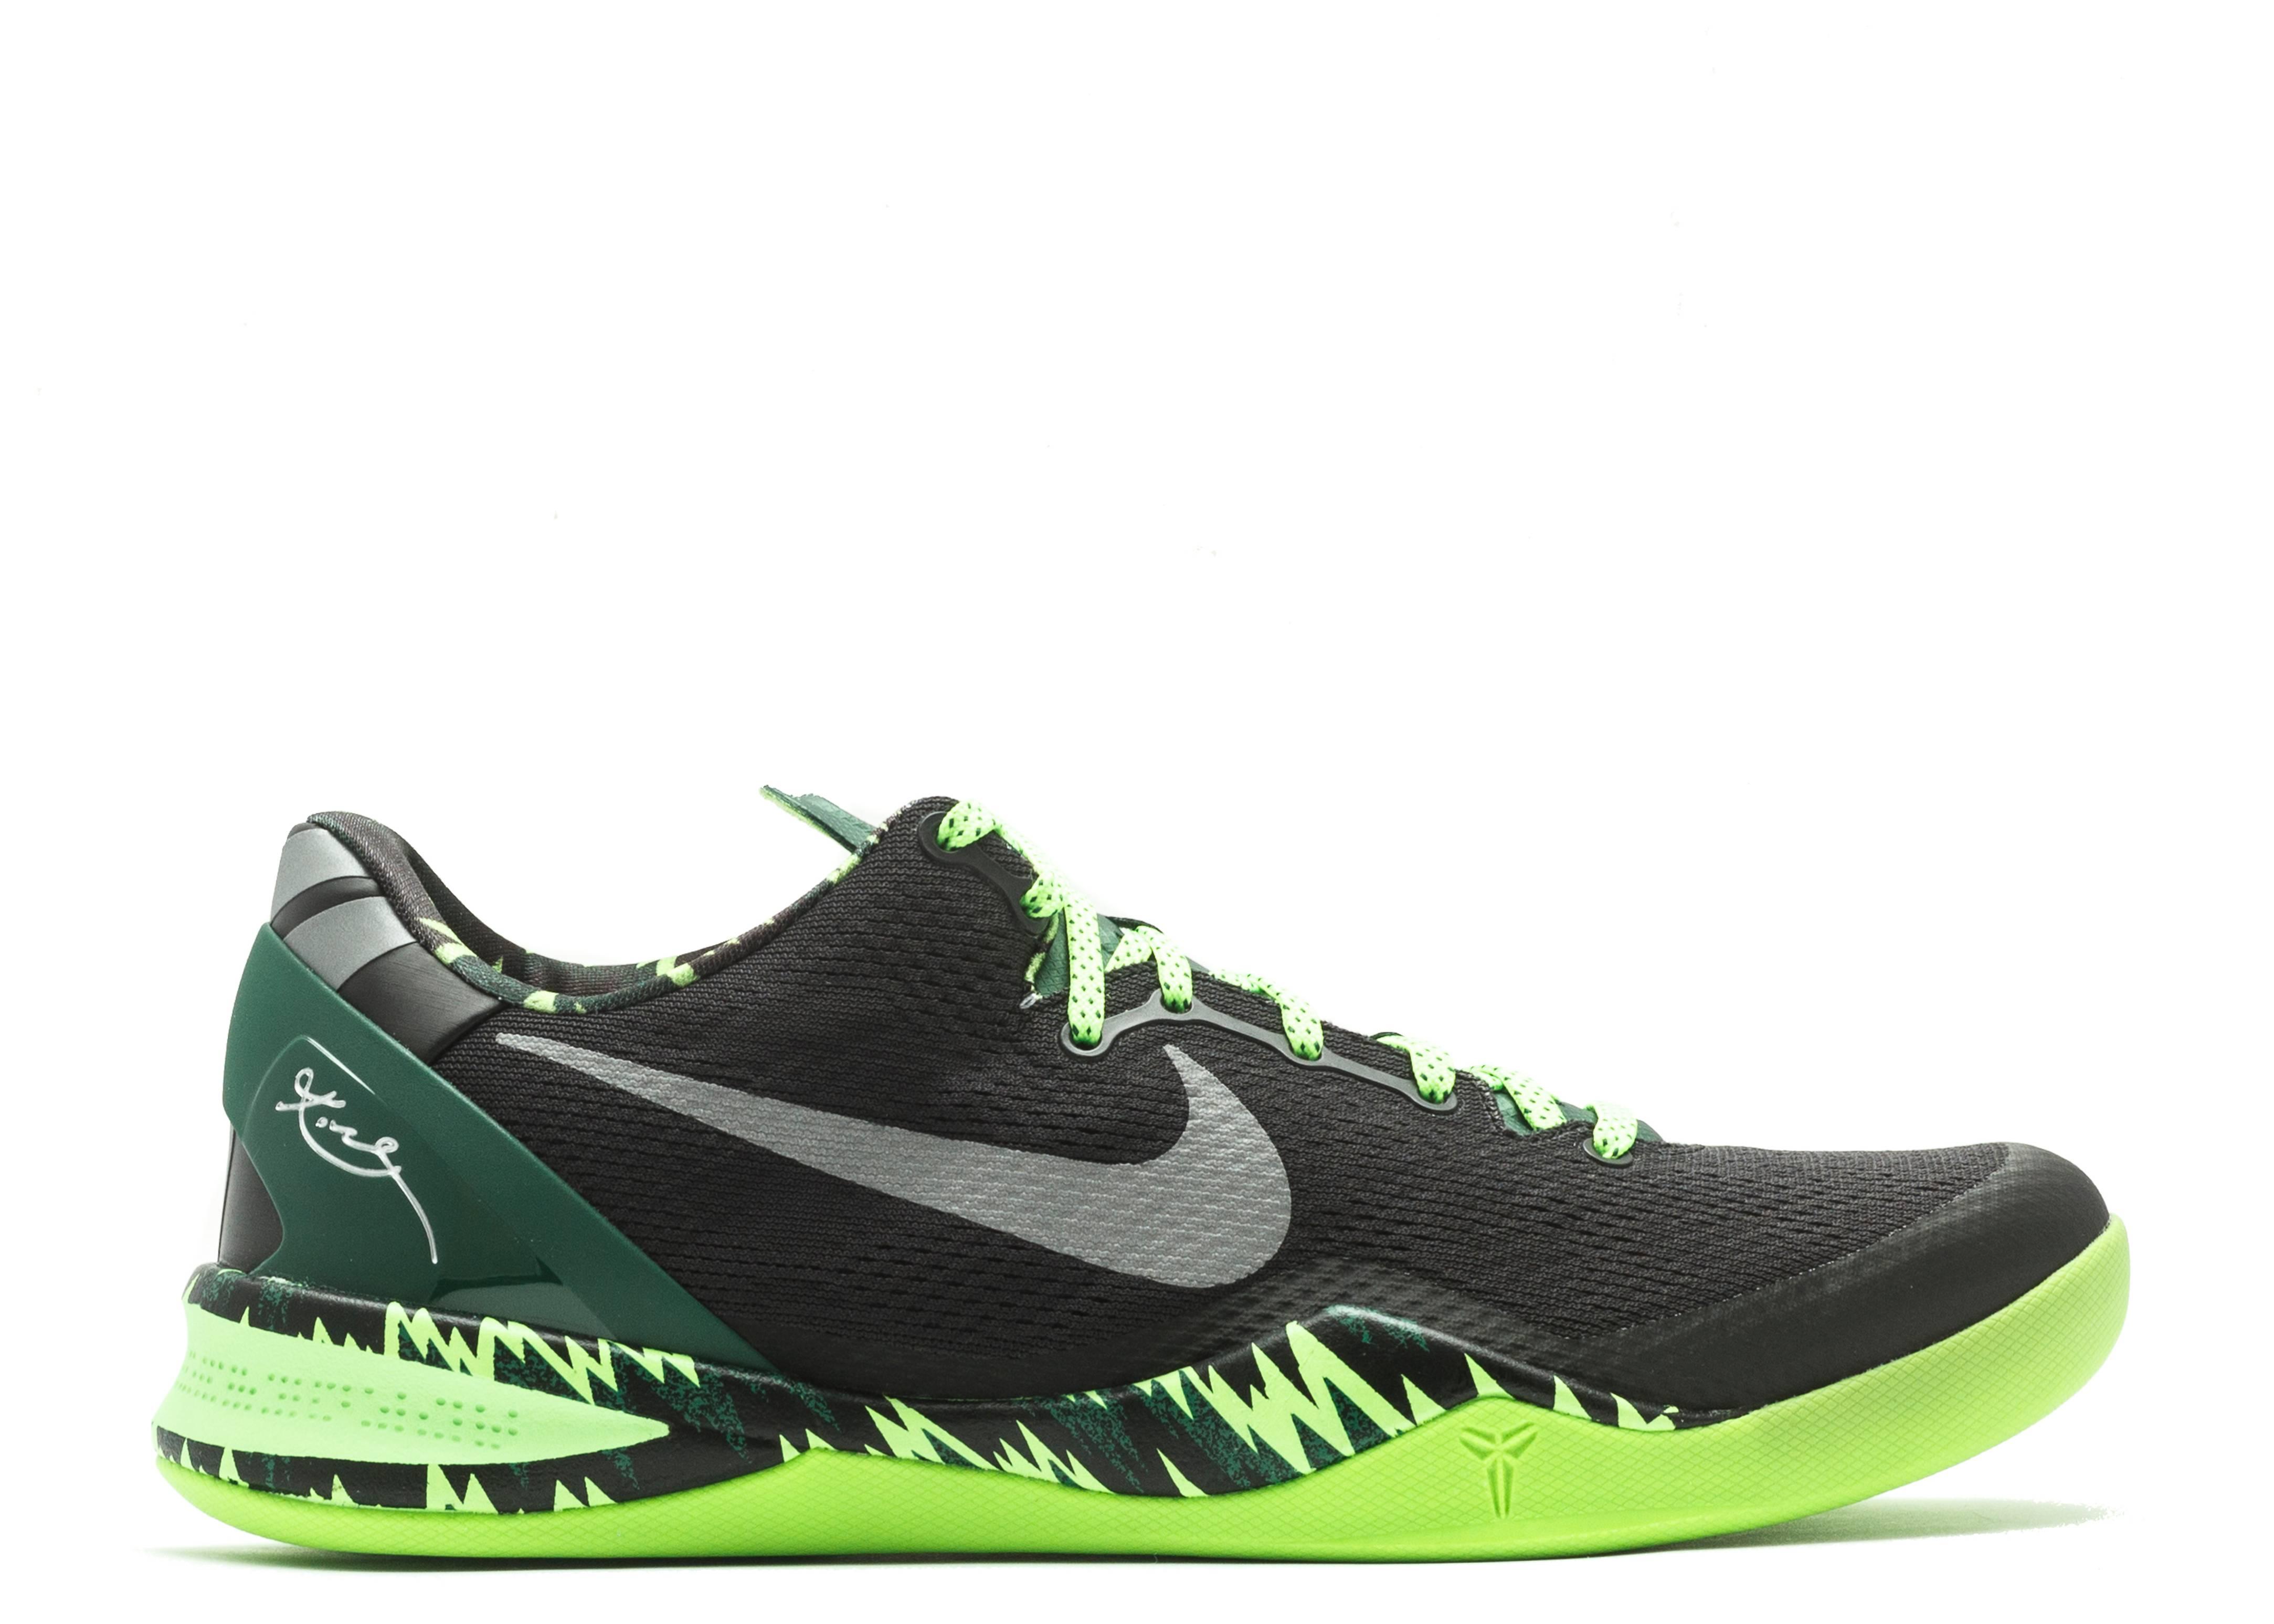 7cbf1fbd35ae Kobe 8 System Pp - Nike - 613959 003 - black gorge green-mtllc ...